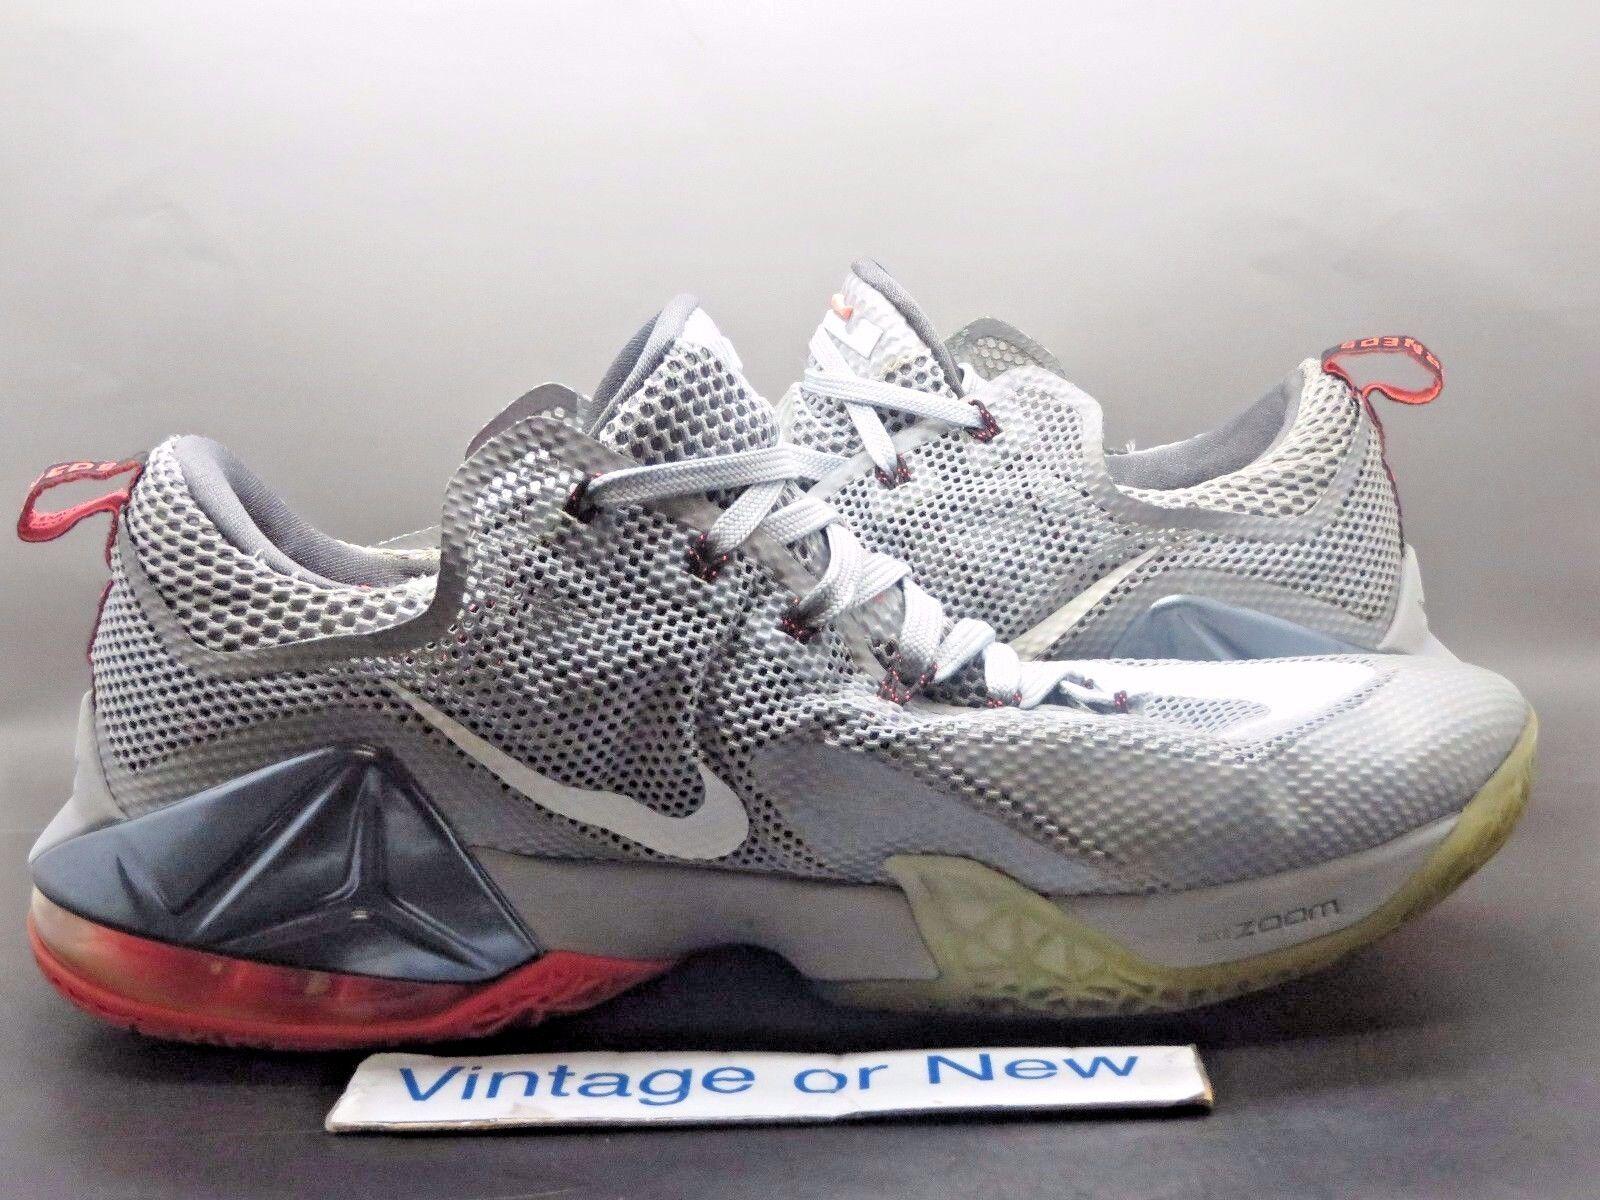 online store 5c8f9 1f3cc ... Nike LeBron LeBron LeBron XII 12 Low Wolf Grey White Hot Lava sz 13  c675d1 ...